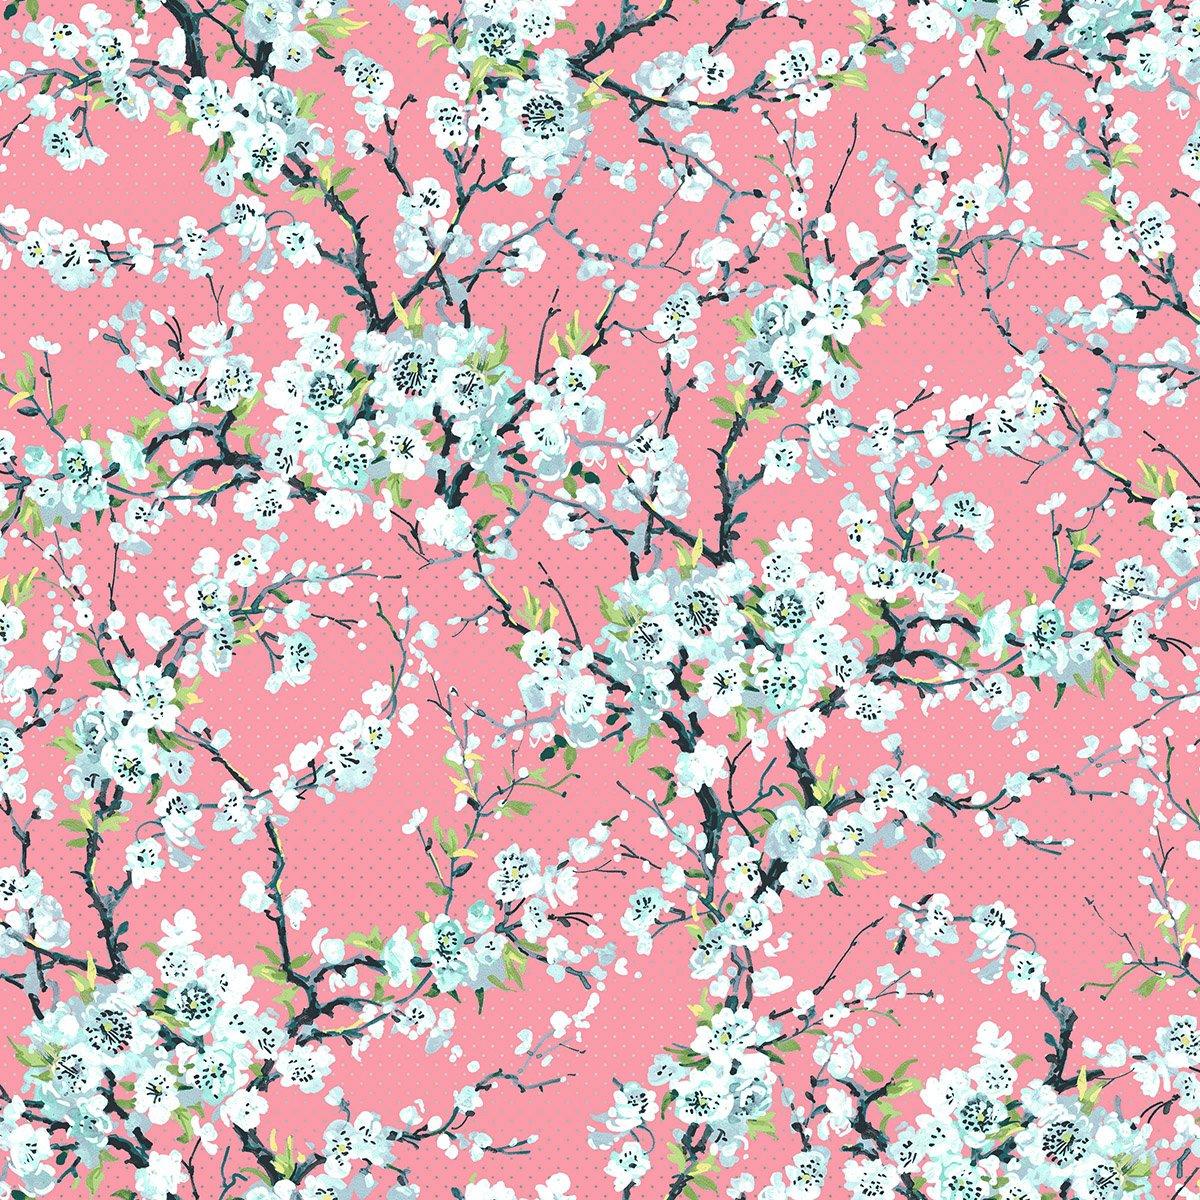 Remnant - 1/2 yd RJR - Serene Spring - First Florish - Blush - 3254-03